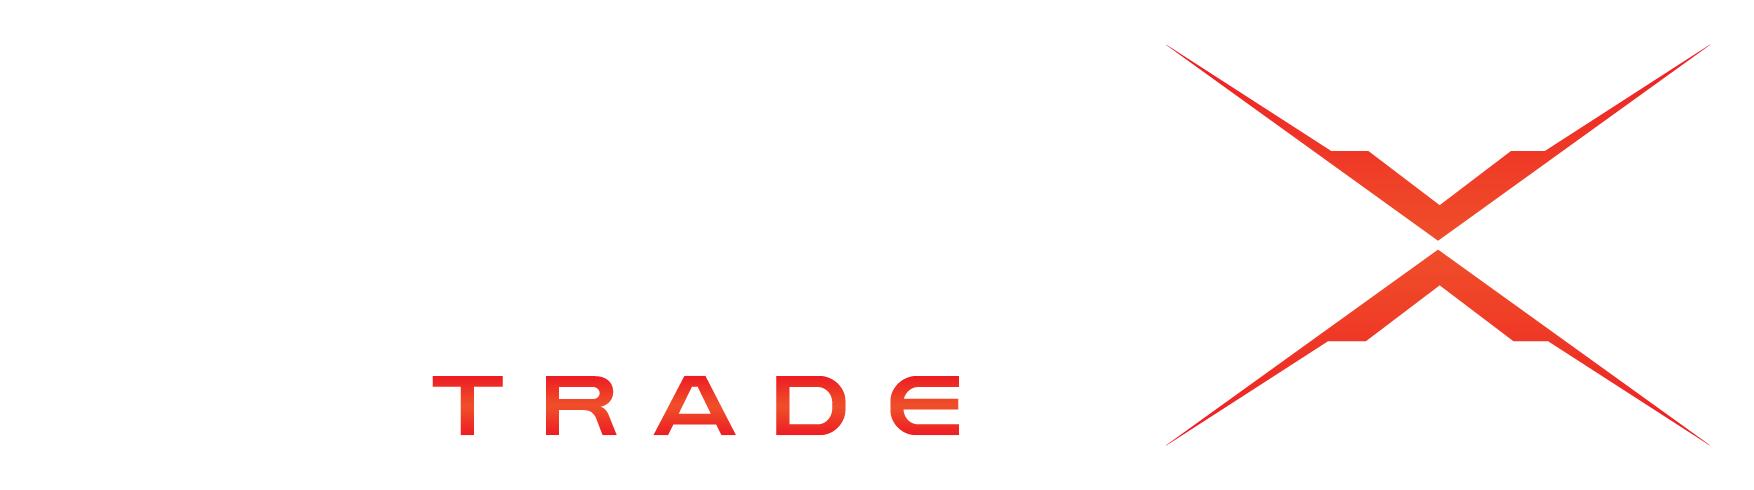 Velox Trade logo